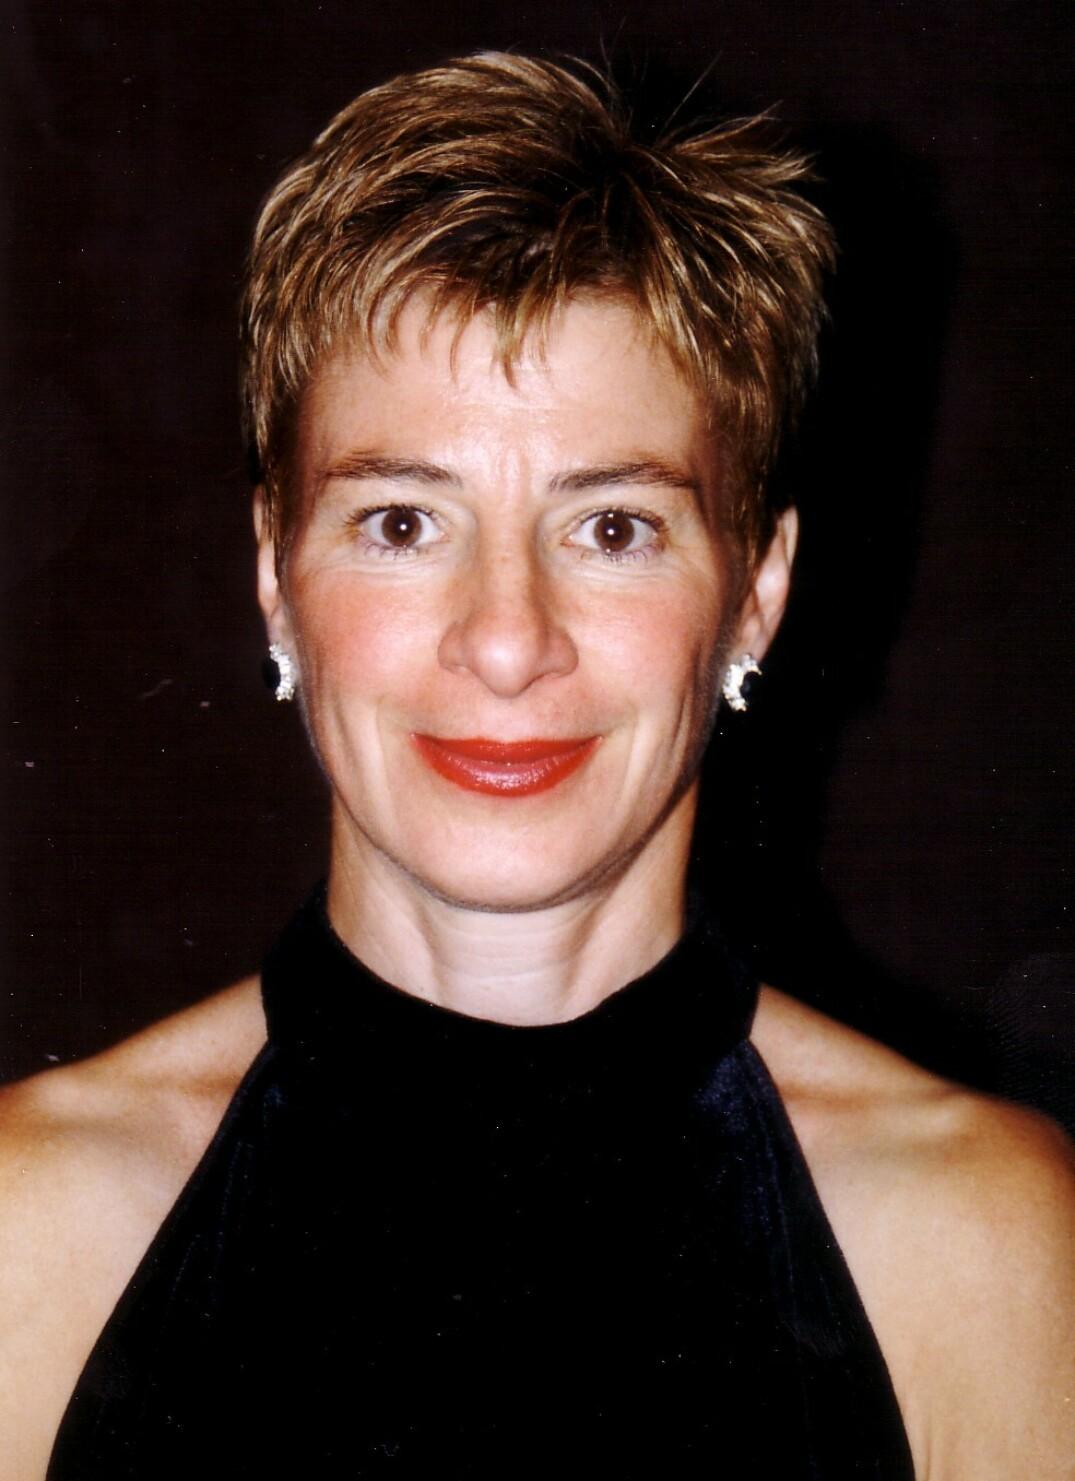 Cvanier1996